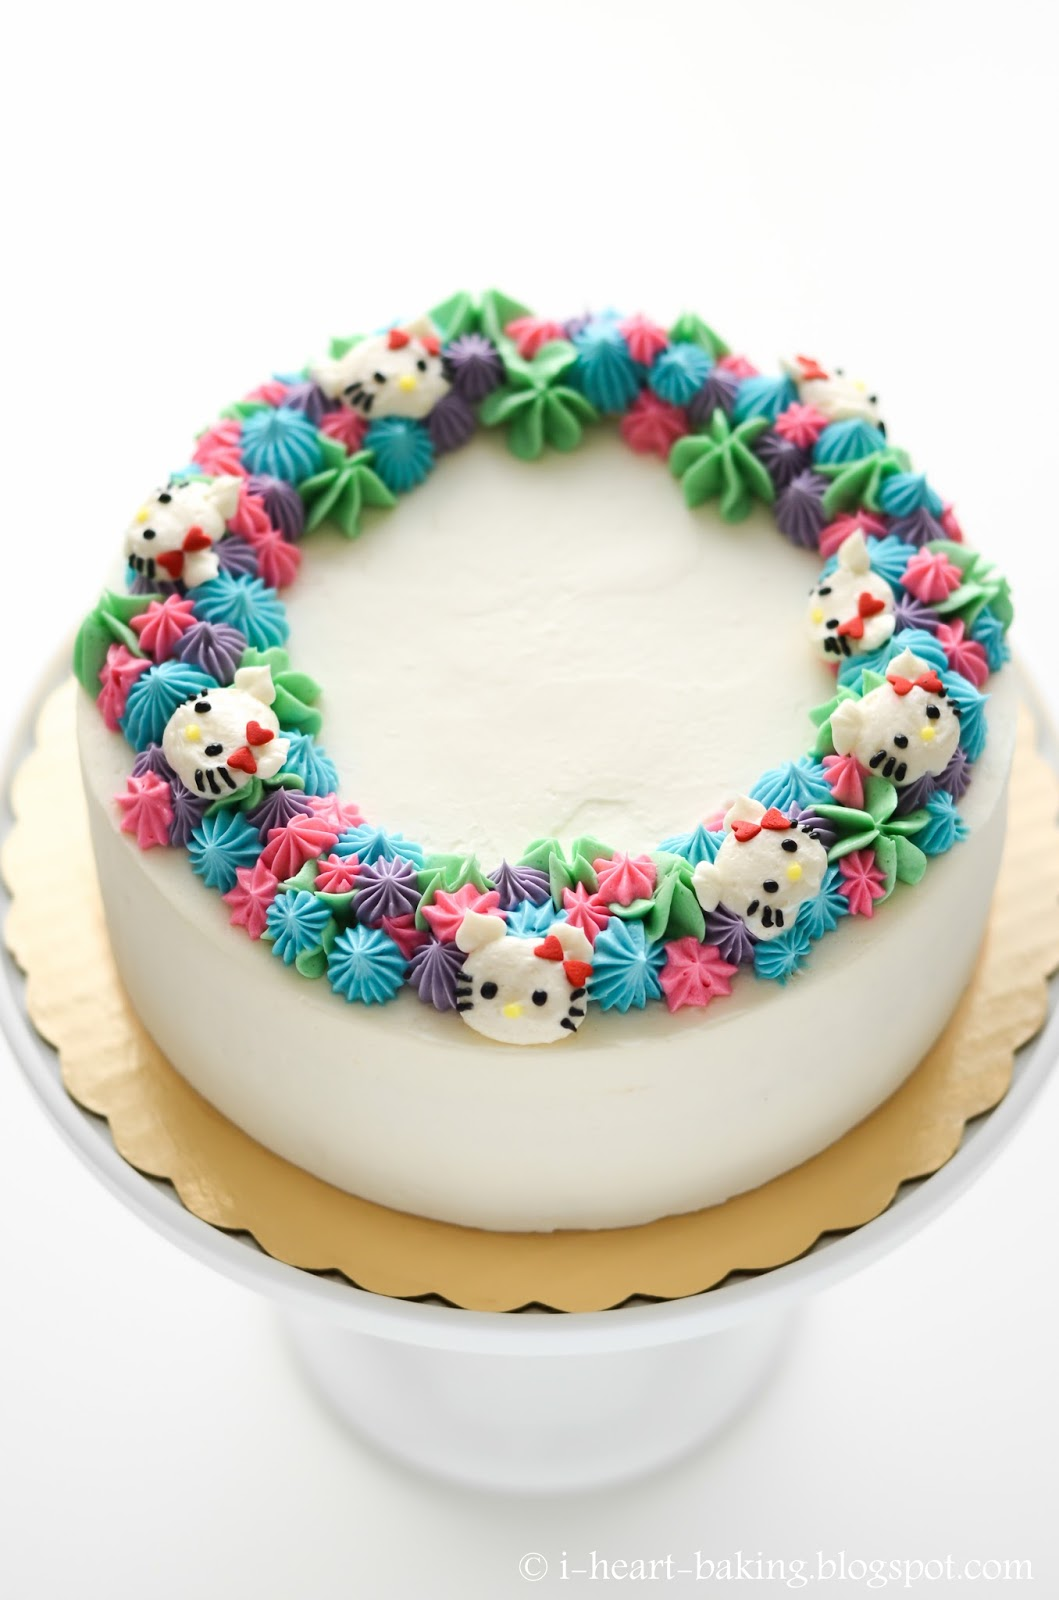 DIY Hello Kitty floral wreath cake